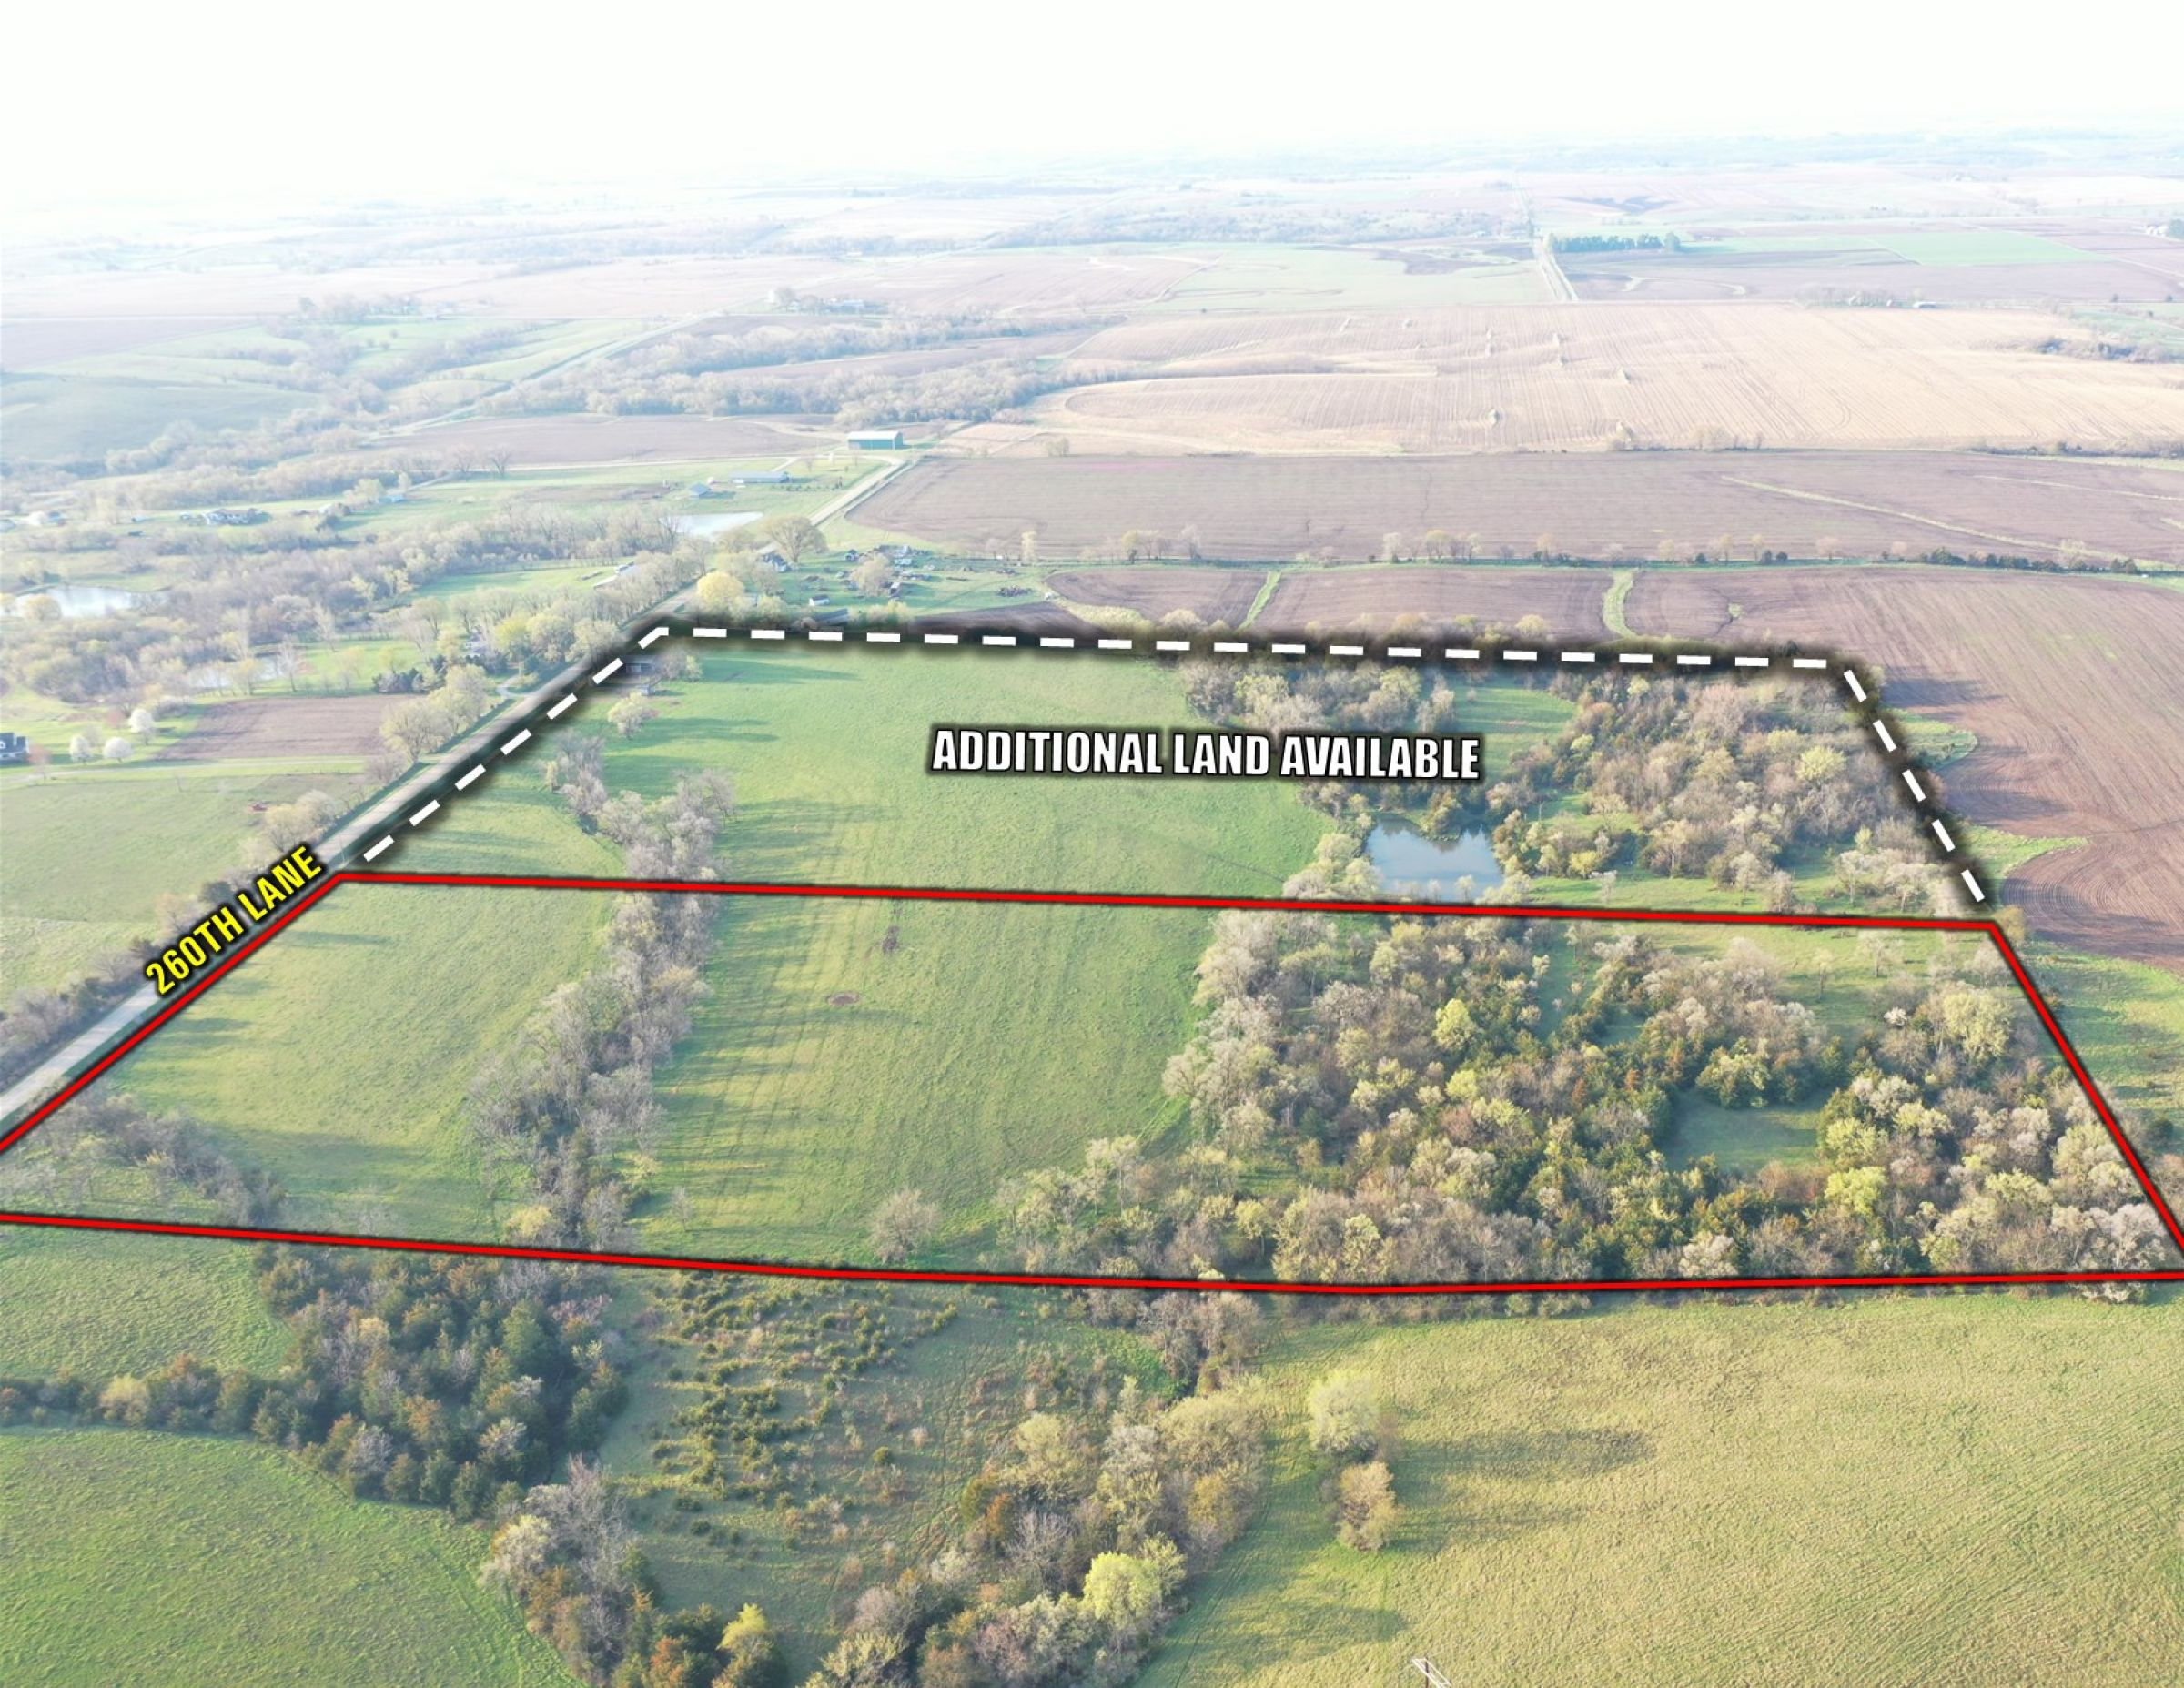 land-madison-county-iowa-20-acres-listing-number-15500-1-2021-05-05-035641.jpg